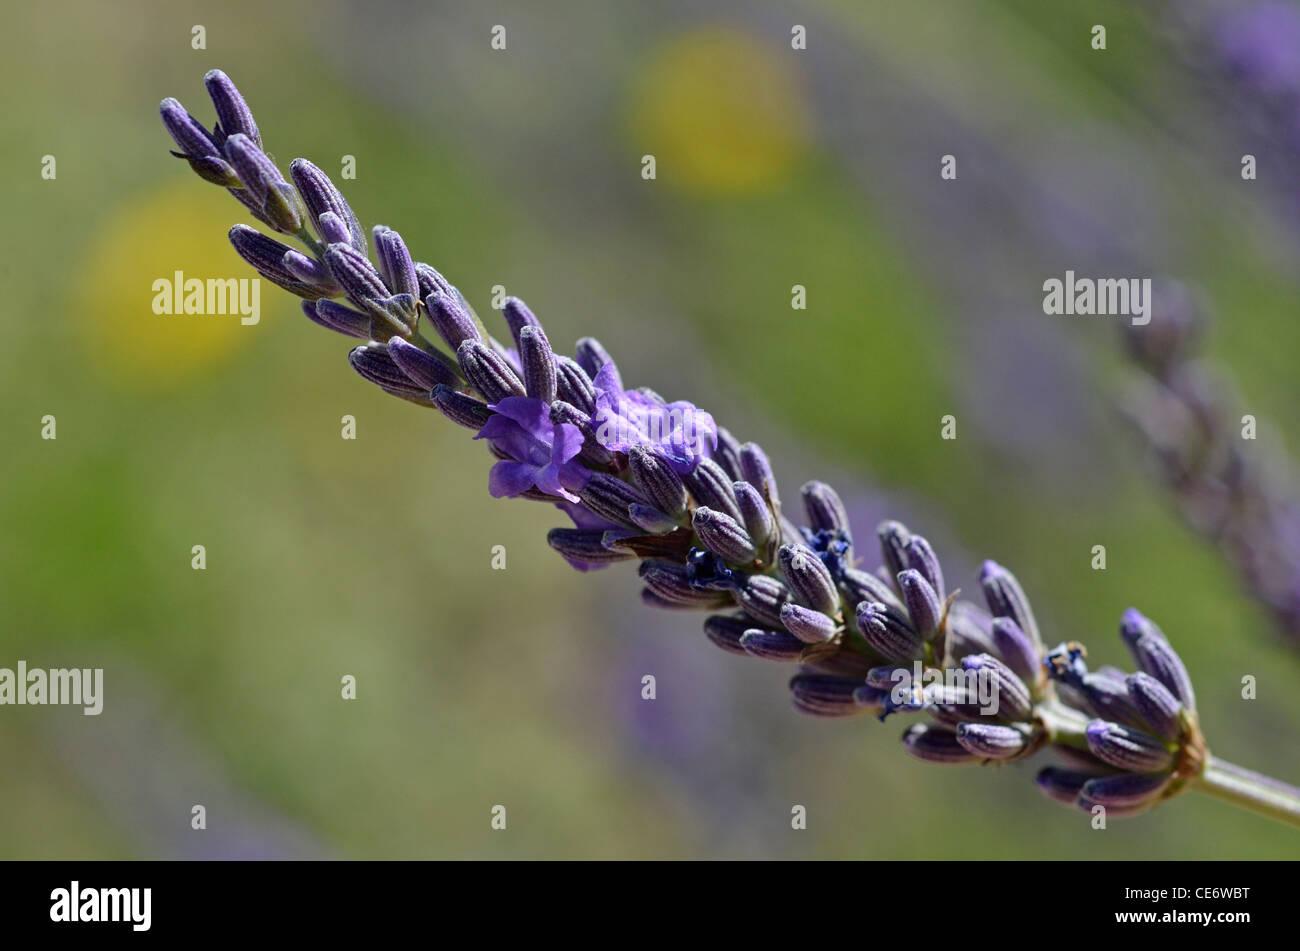 Lavender flower - Lavandula - close-up, Provence, France - Stock Image